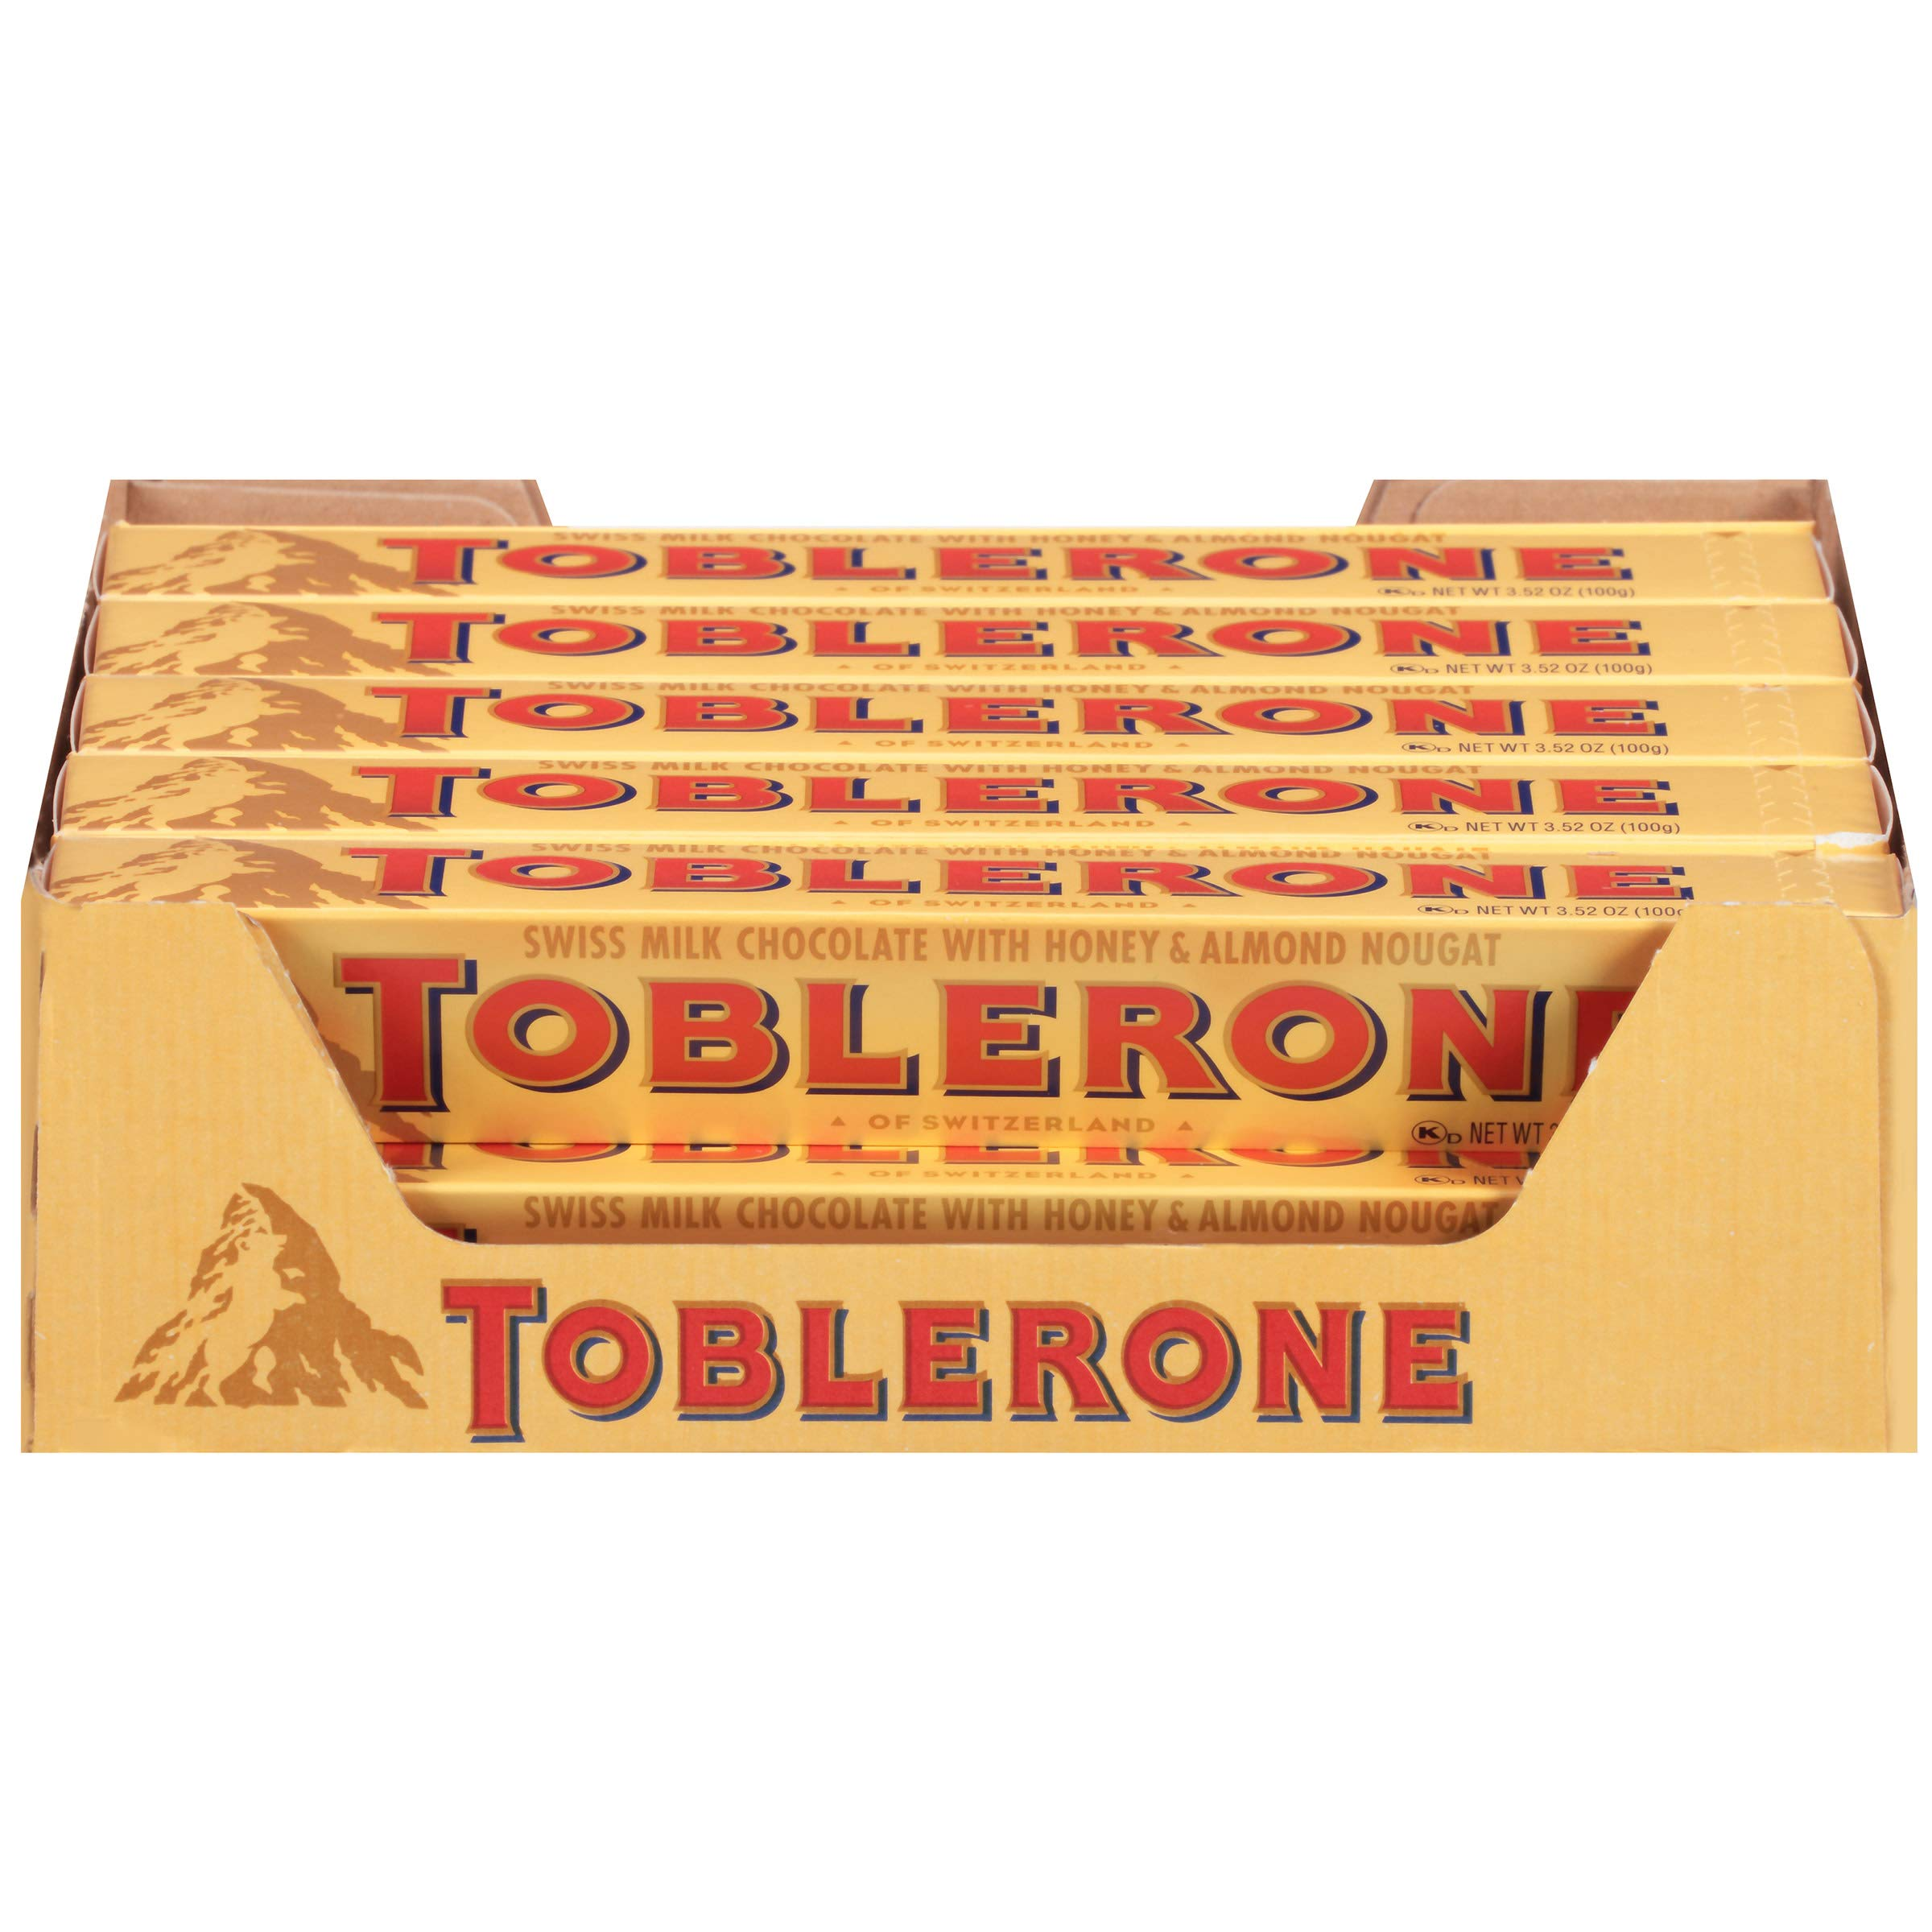 Toblerone Swiss Milk Chocolate with Honey & Almond Nougat, 20 - 3.52 oz Bars